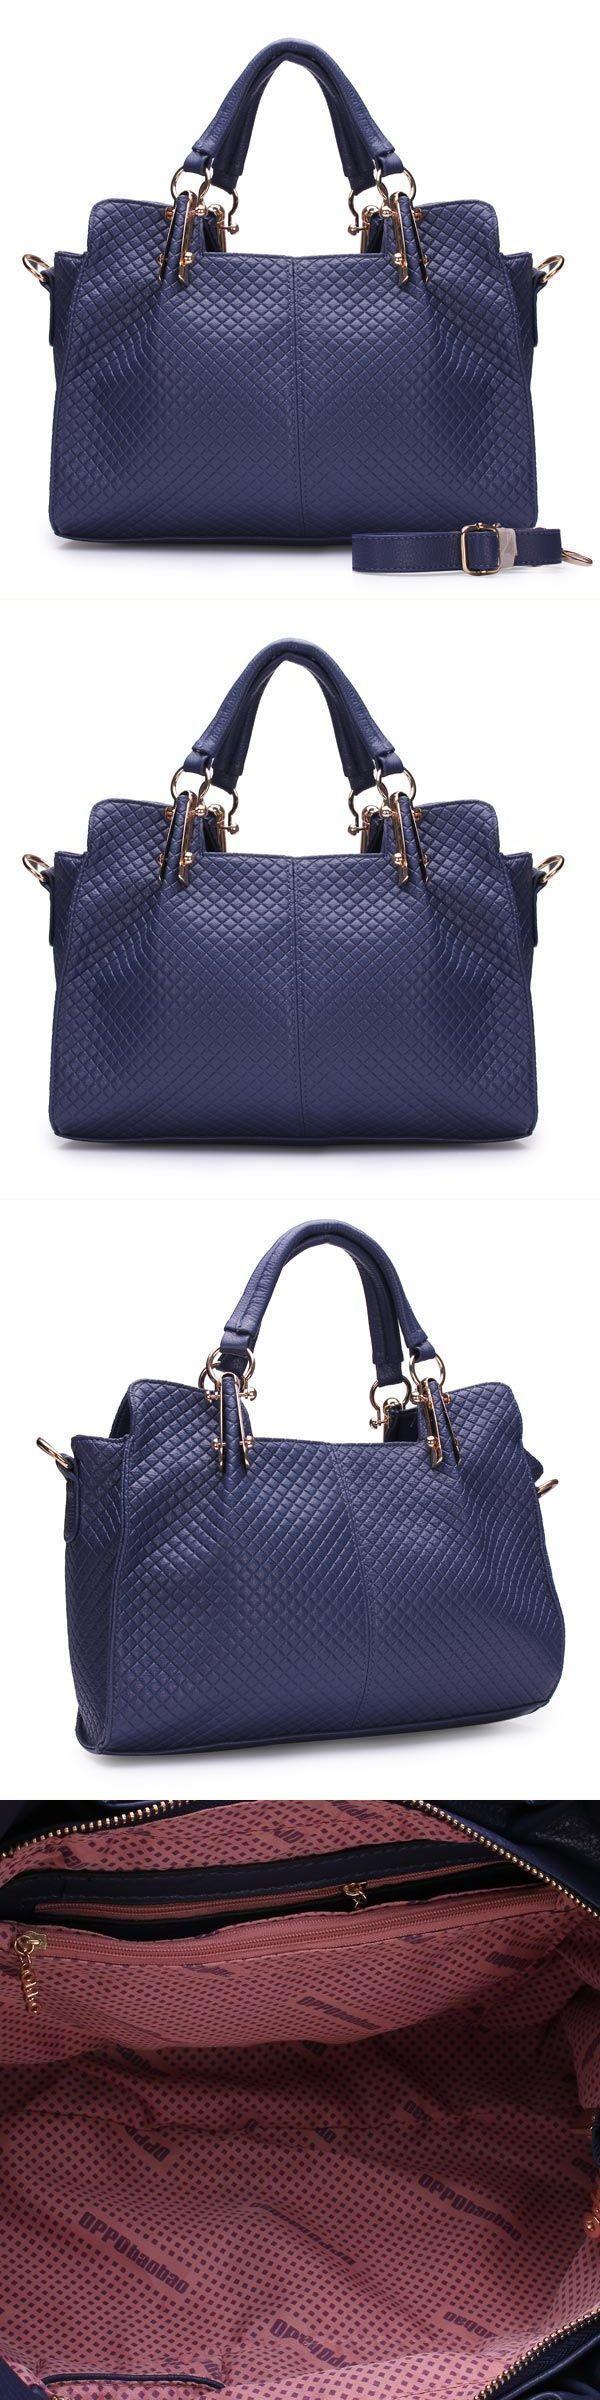 7286 Handbags Women 8217 S Croco Pu Leather Totes Crossbody Bags